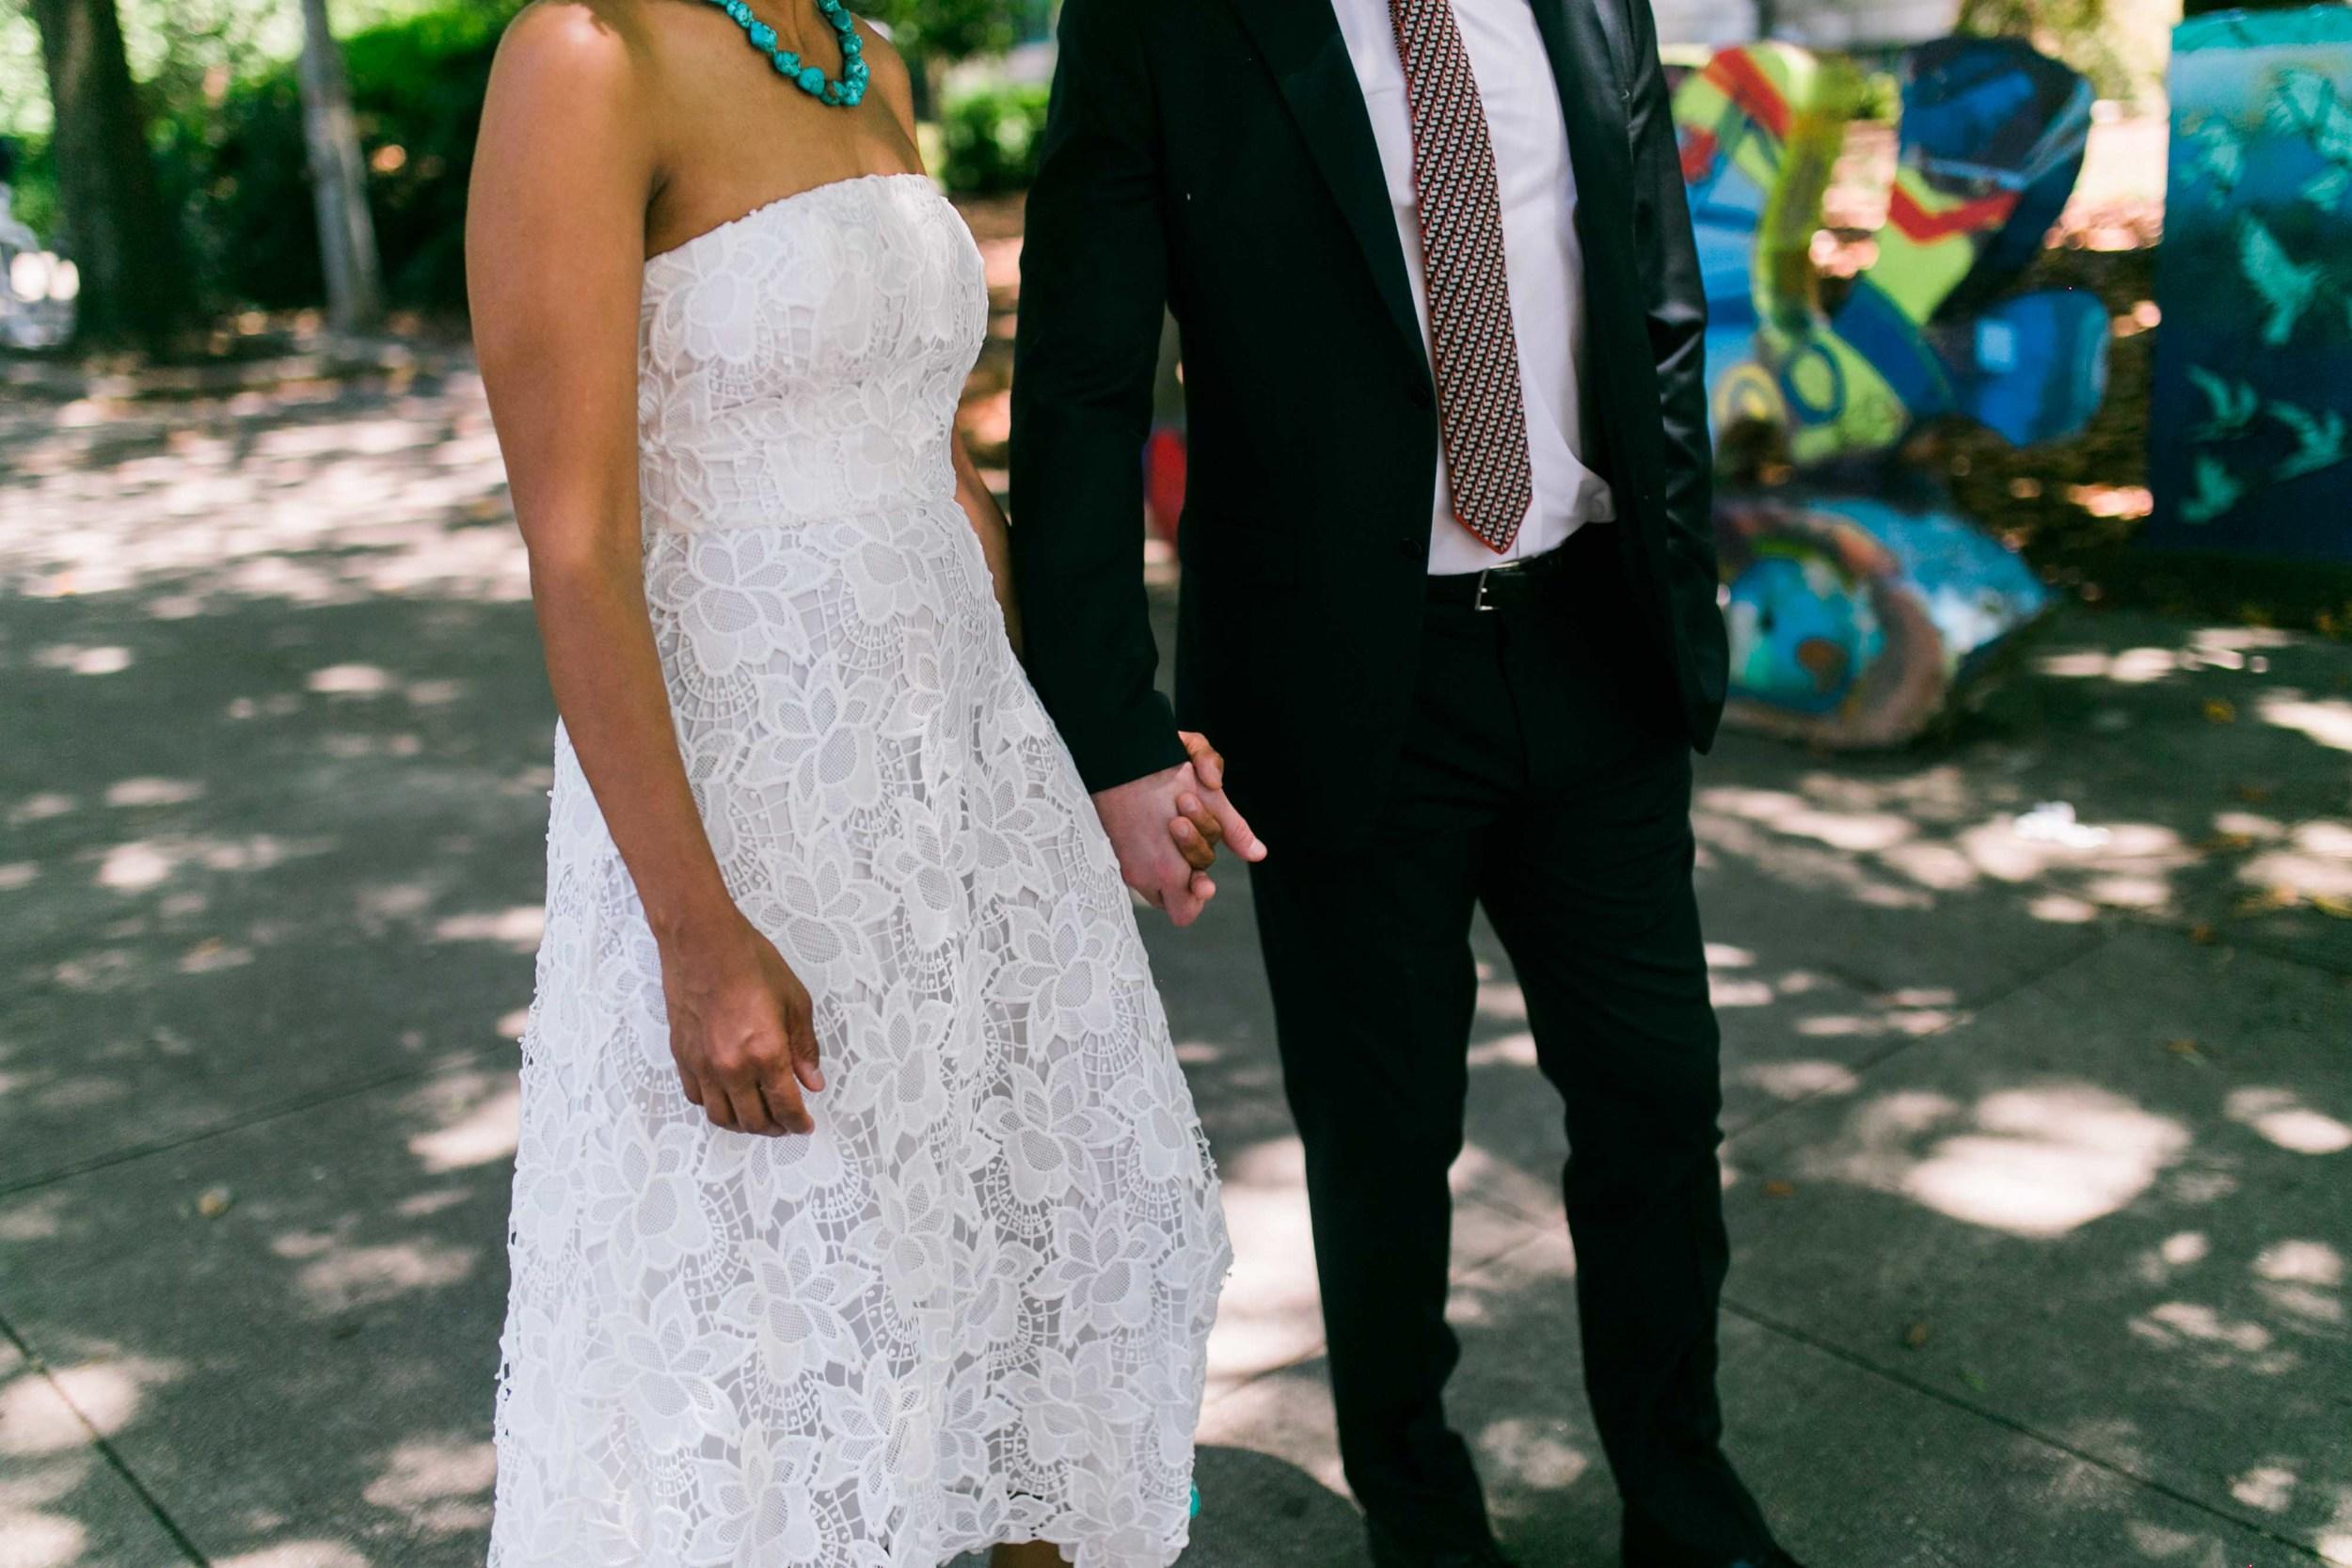 Dekalb-County-Courthouse-Wedding-Photos-Kiyah-C-Photography-54.jpg